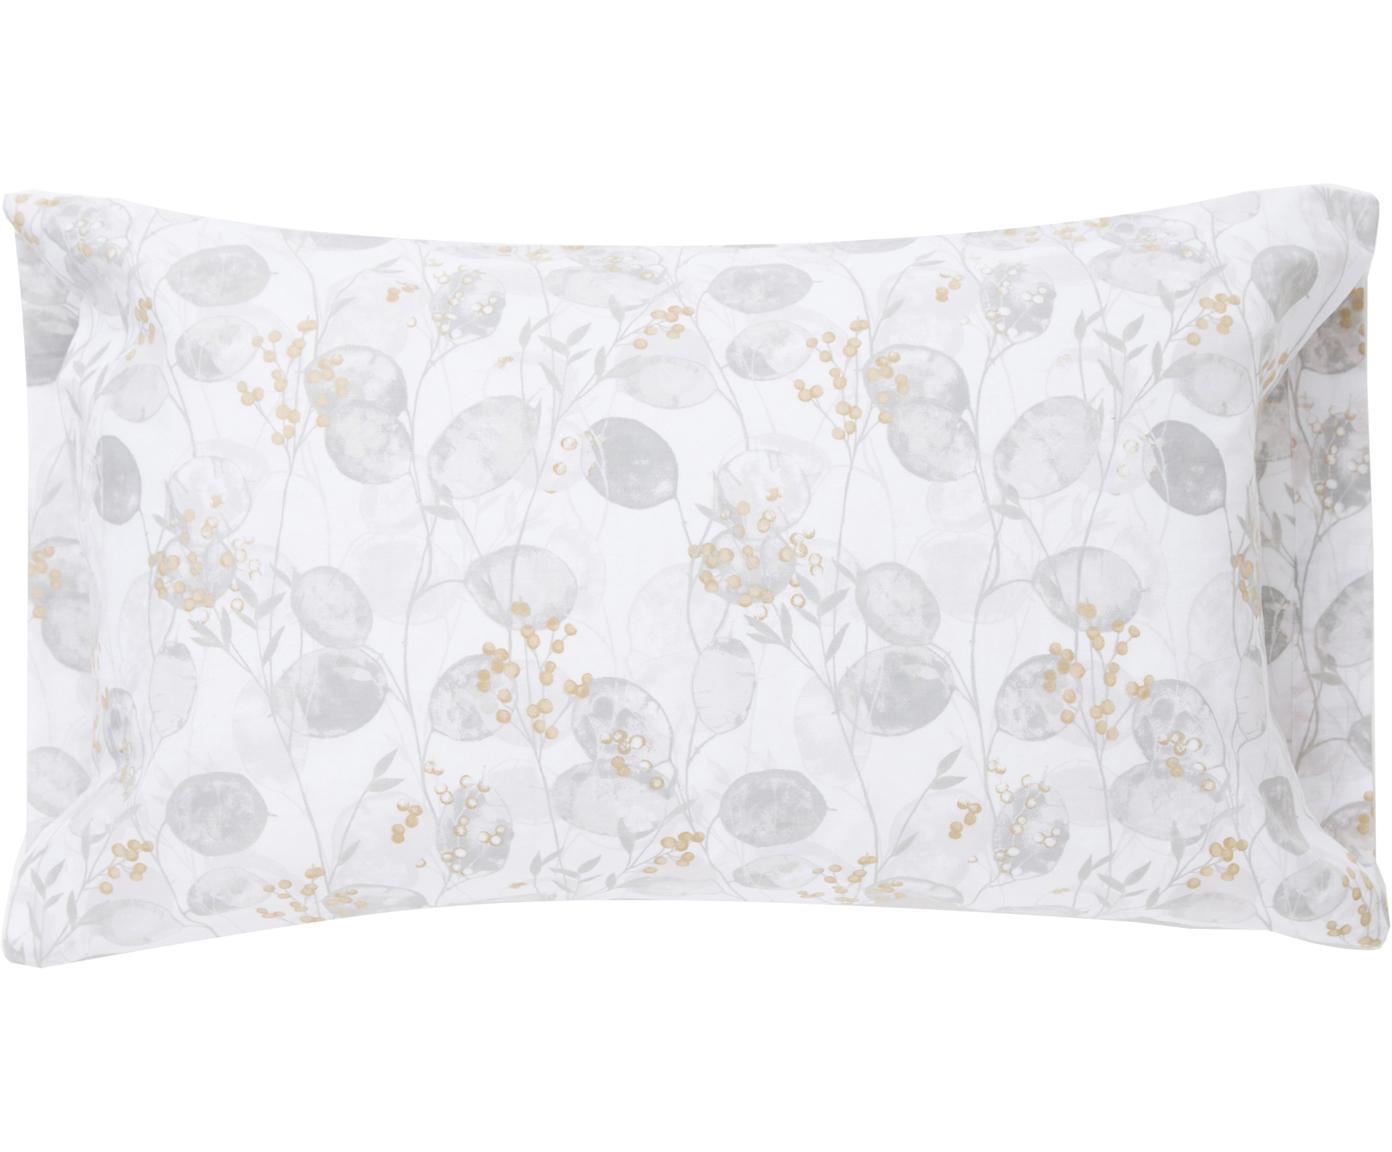 Funda de almohada Honesty, Algodón, Tonos grises, amarillo, An 50 x L 110 cm